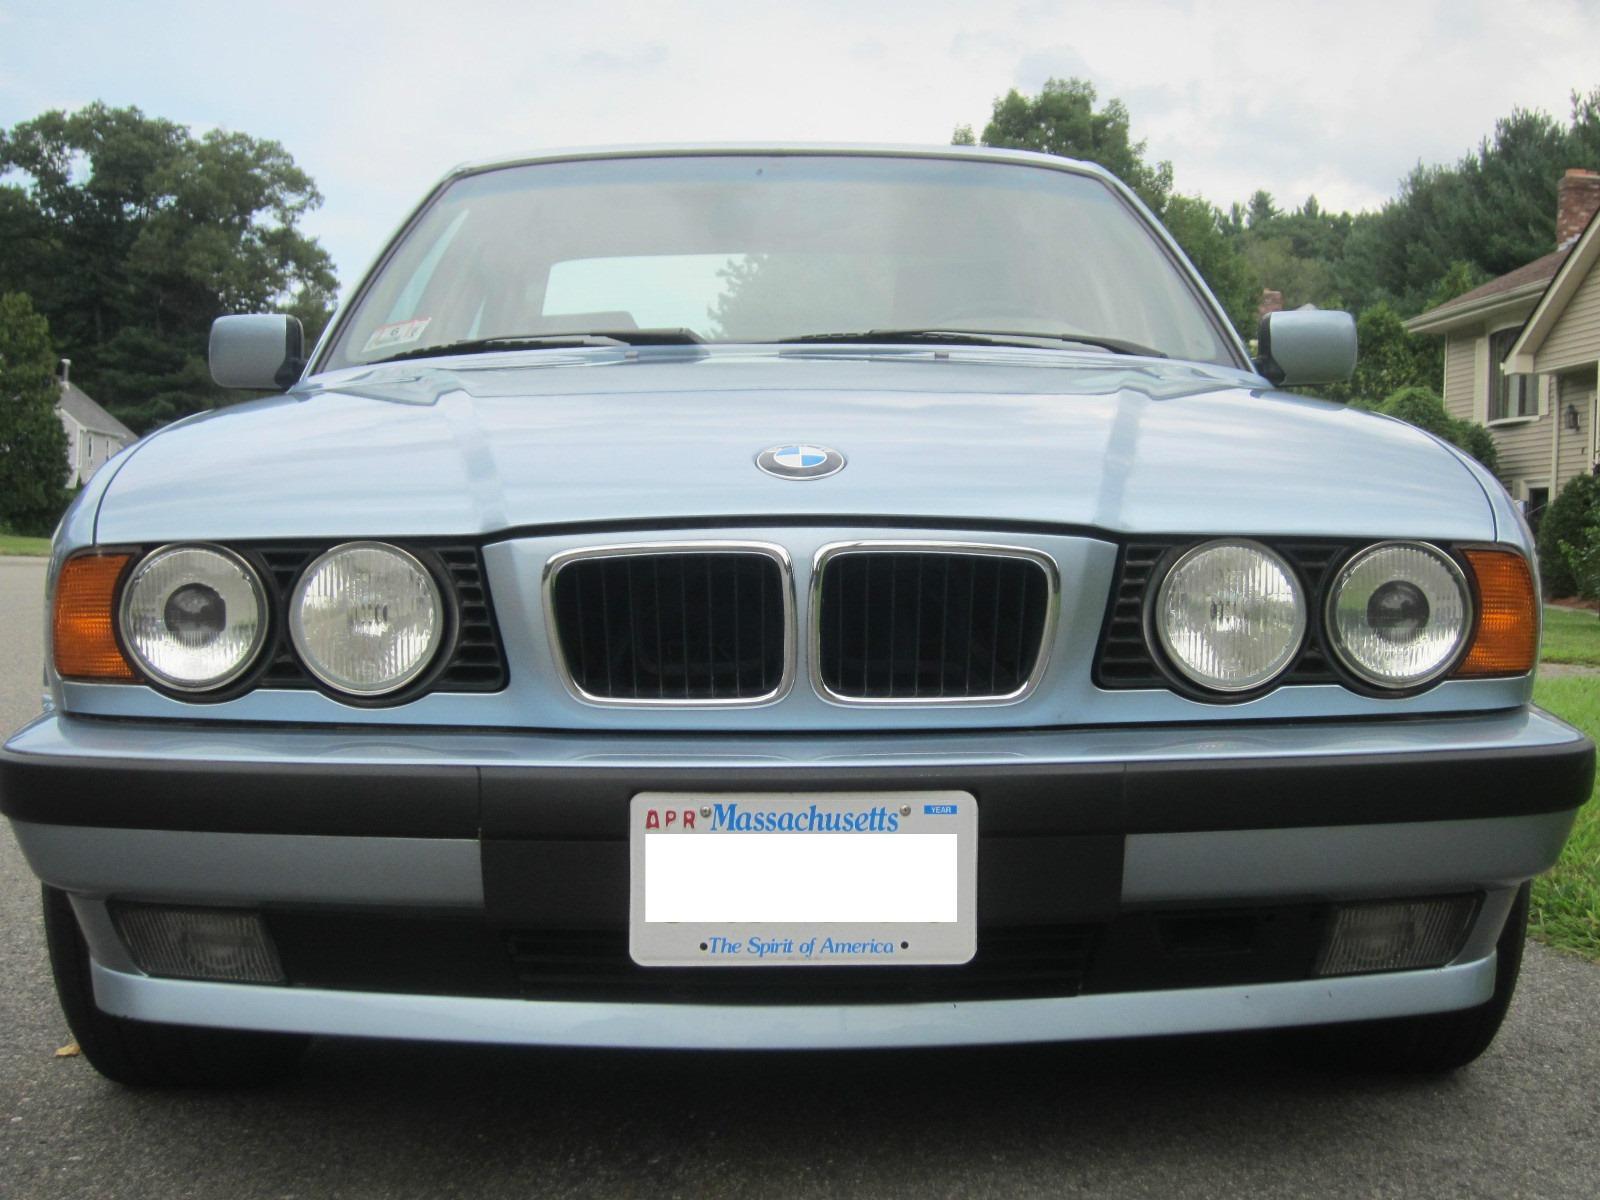 1995-BMW-540i-1Manual%25255B5%25255D.jpg